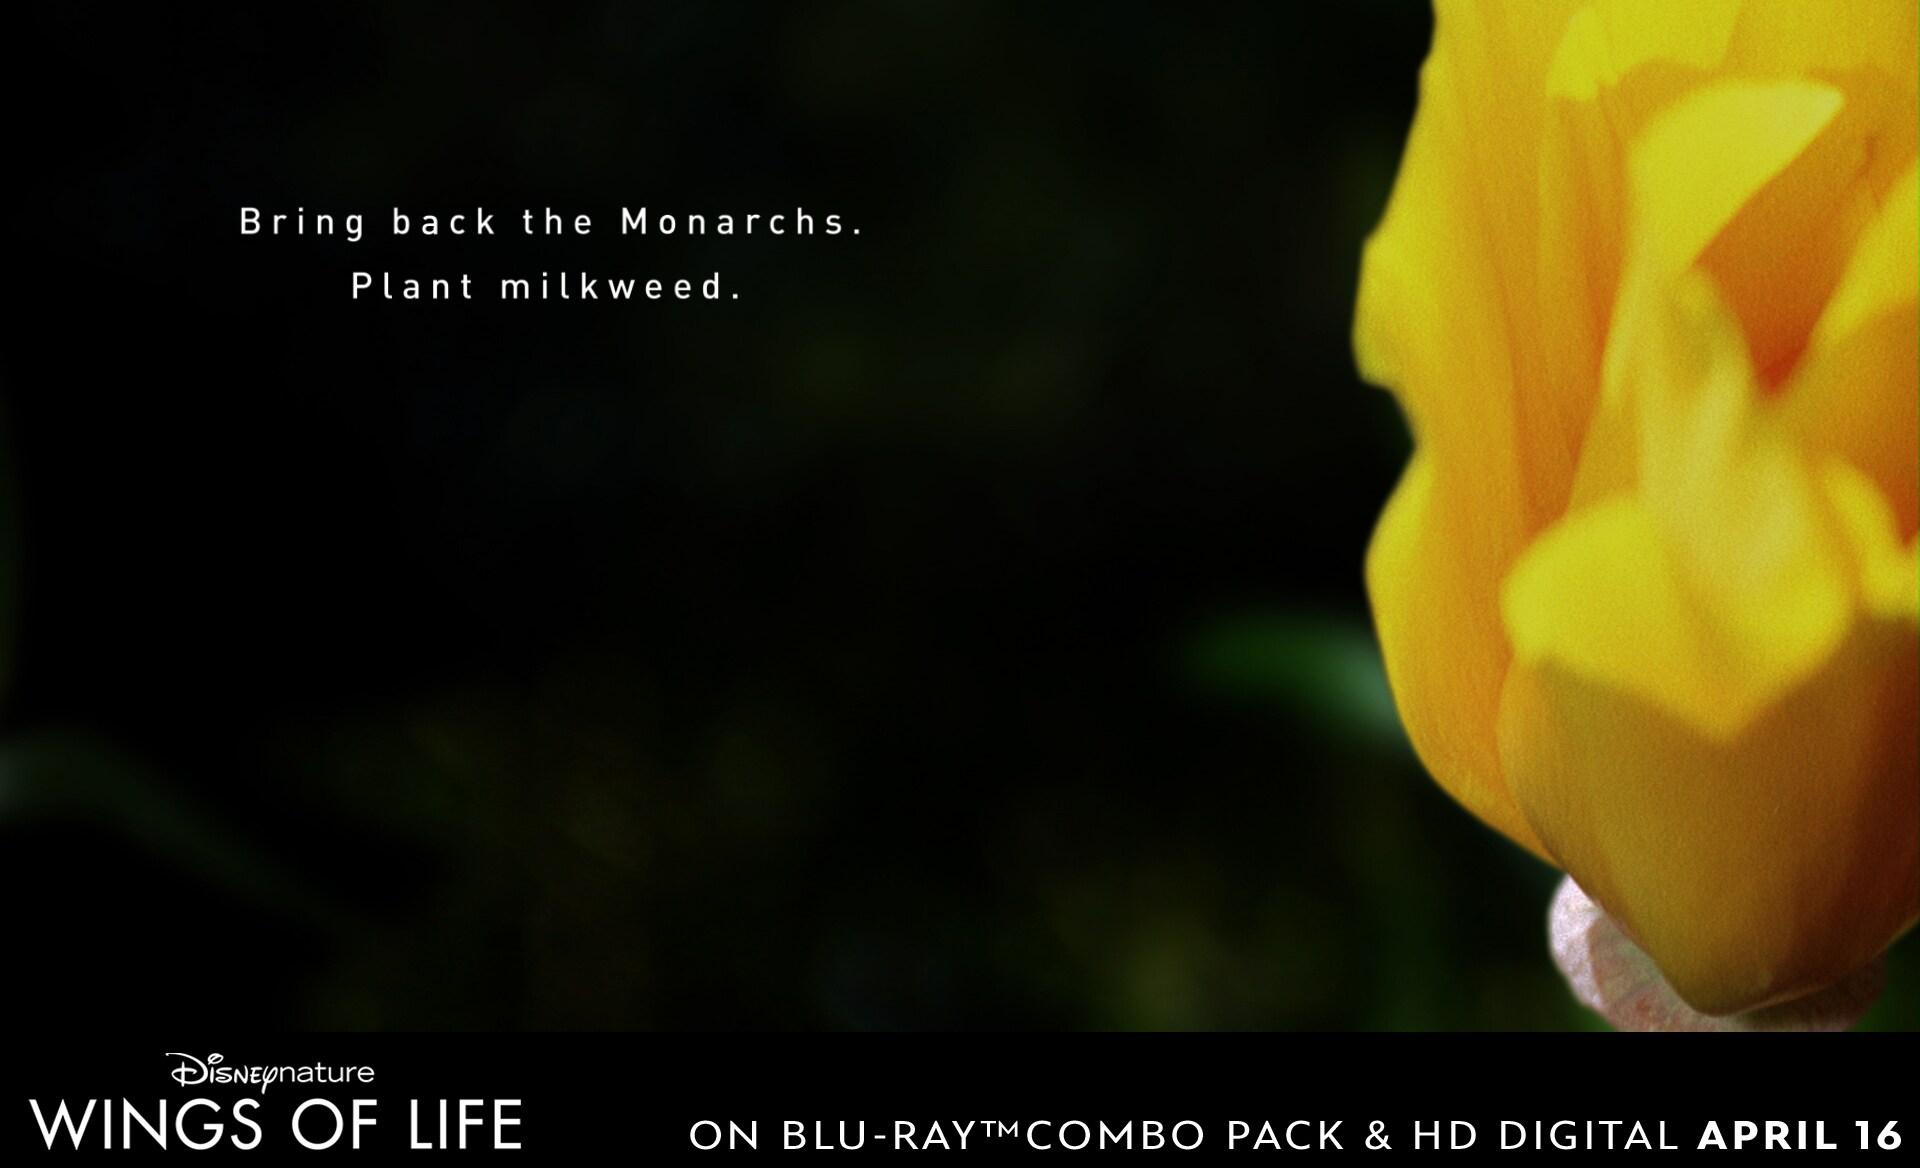 Help bring back the Monarch butterflies by planting milkweed.